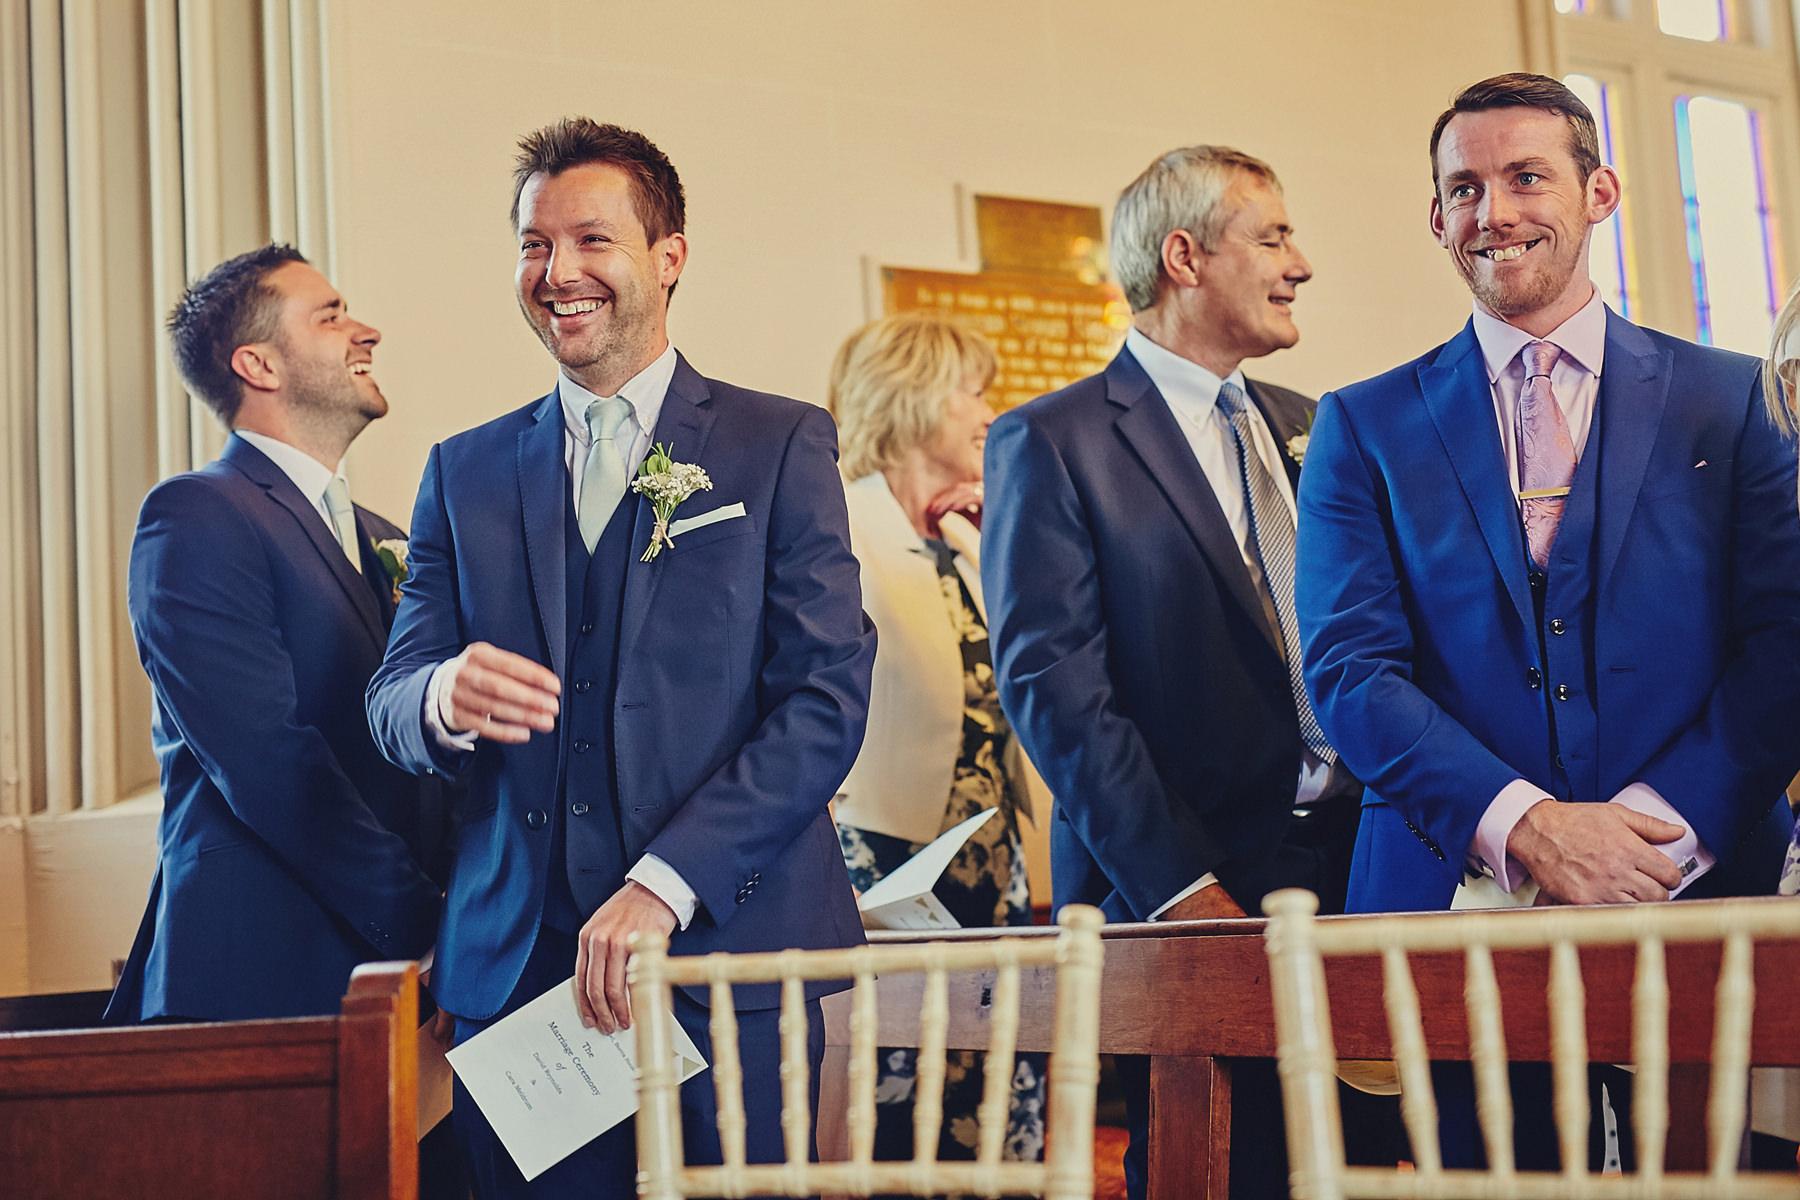 Wedding at Borris House co.Carlow 032 - Borris House wedding | Cara & David